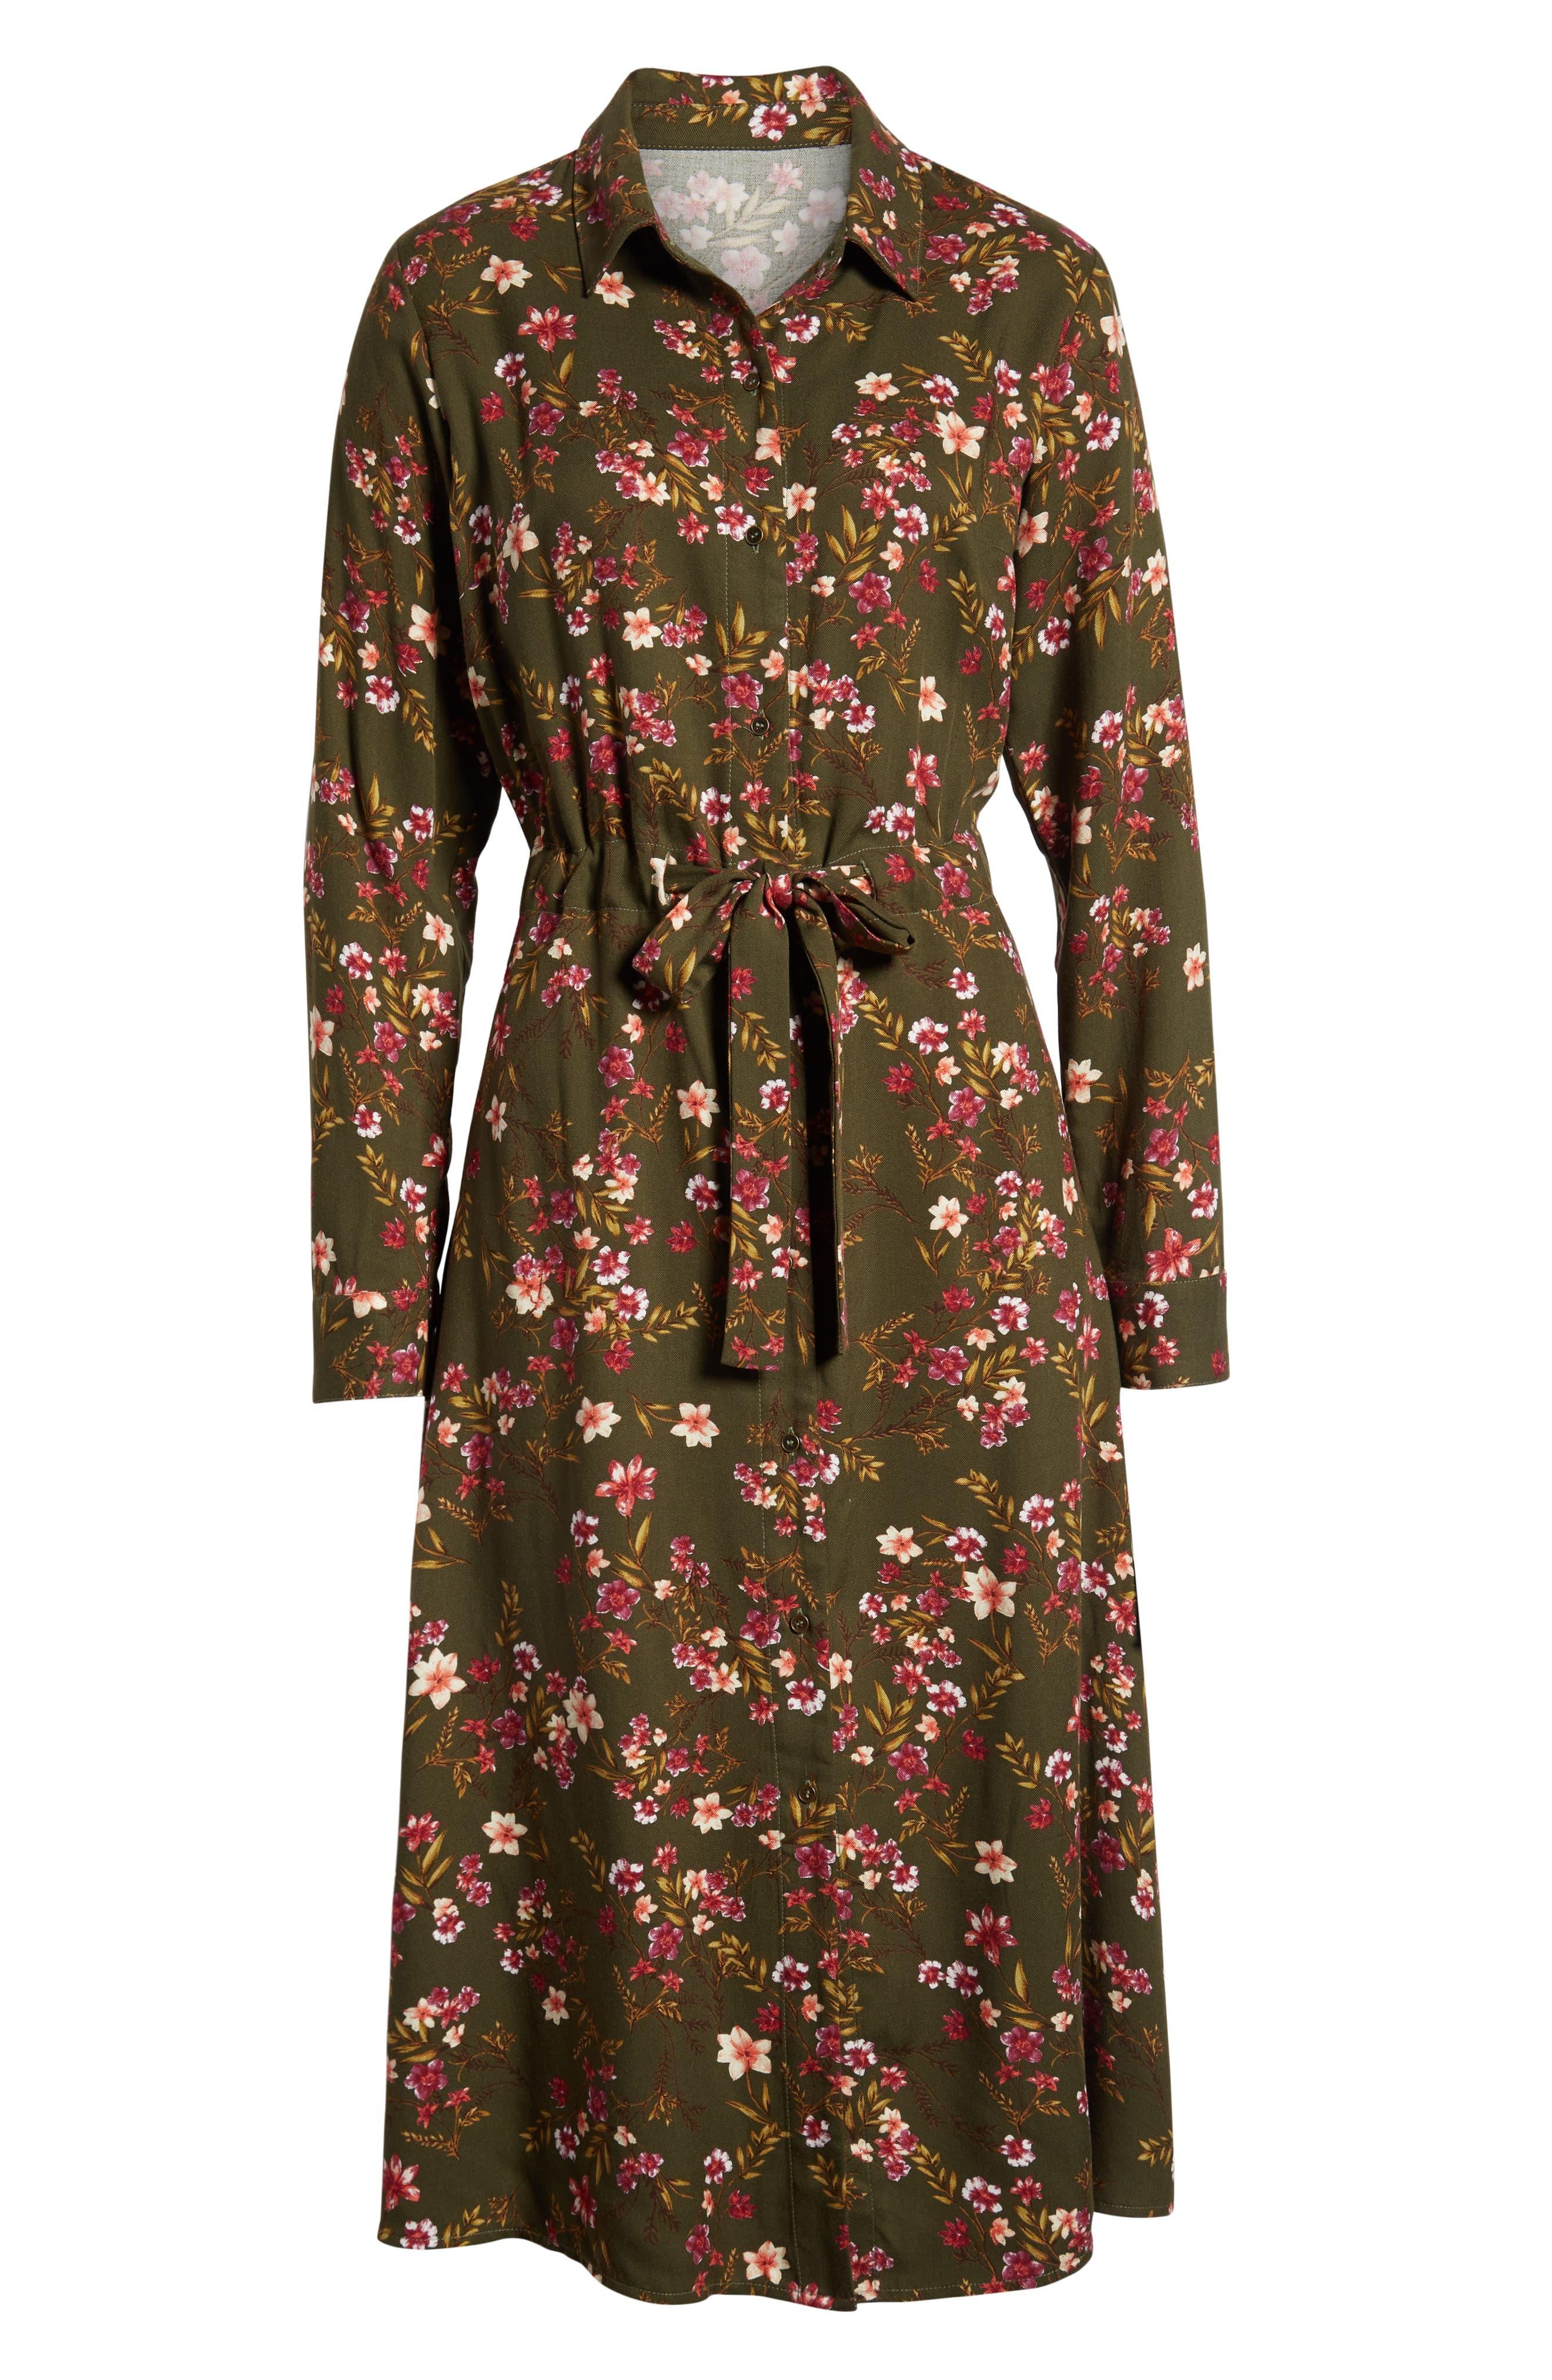 BP., Floral Midi Dress, Alternate thumbnail 7, color, OLIVE BURNT SAVANNAH FLORAL